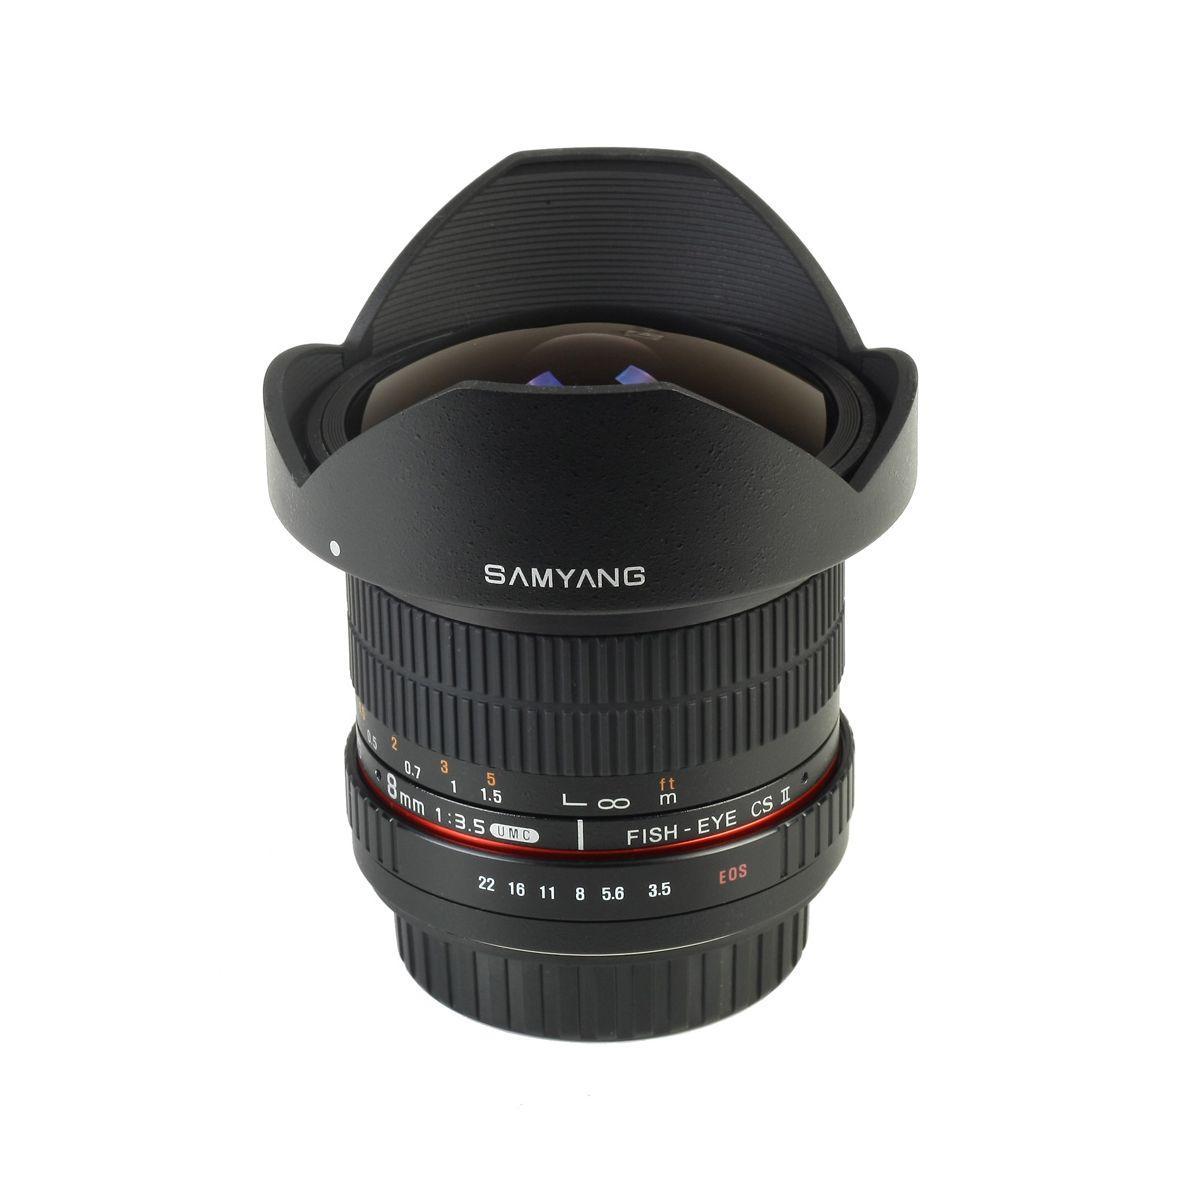 Objectif pour reflex samyang 8mm f/3.5 umc fisheye cs ii nikon